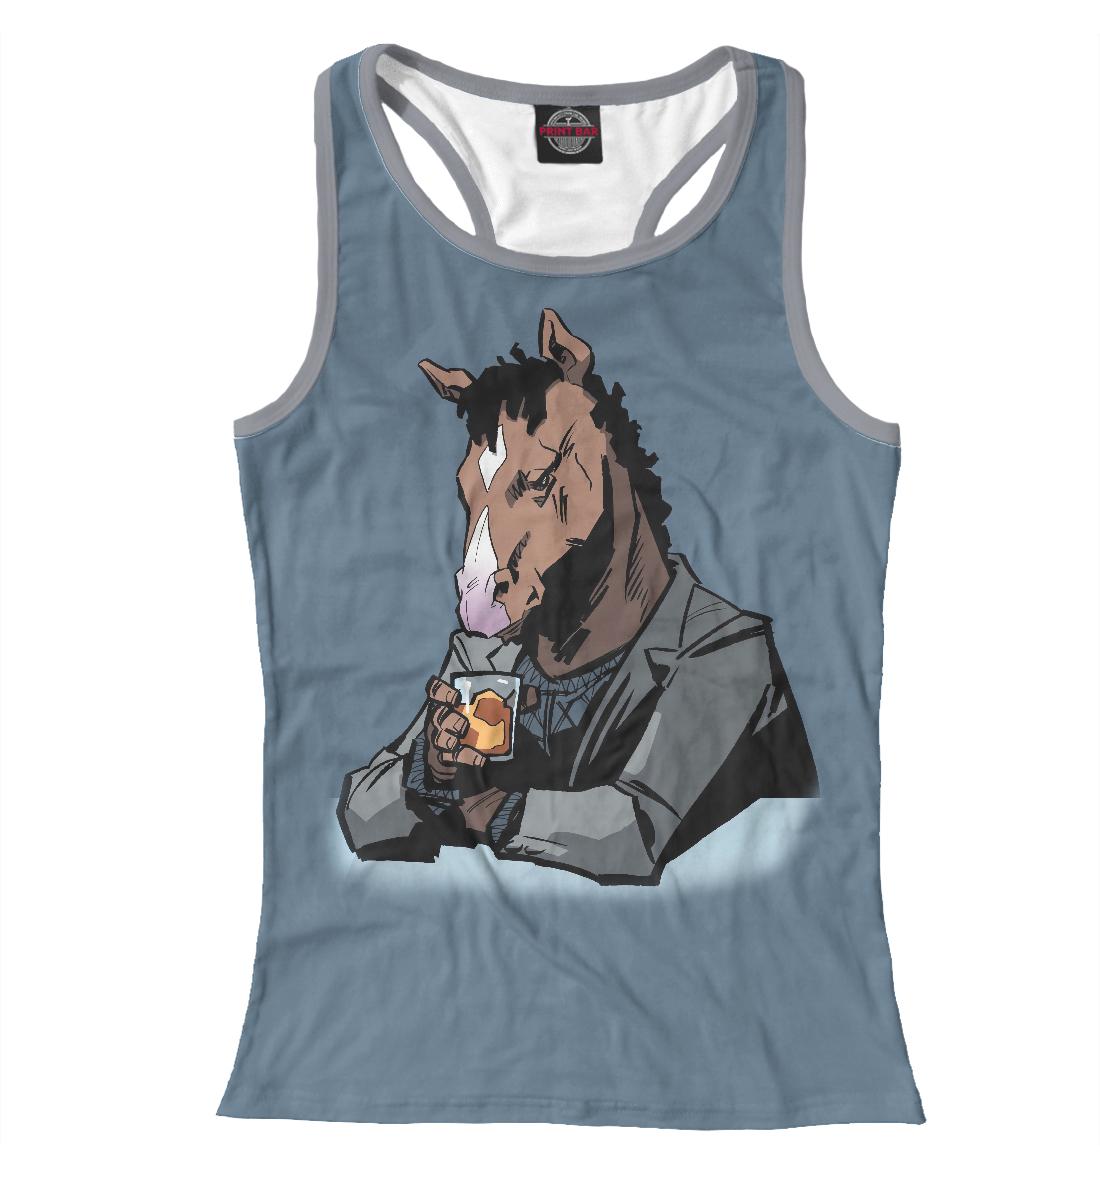 Купить BoJack Horseman, Printbar, Майки борцовки, MFR-551528-mayb-1